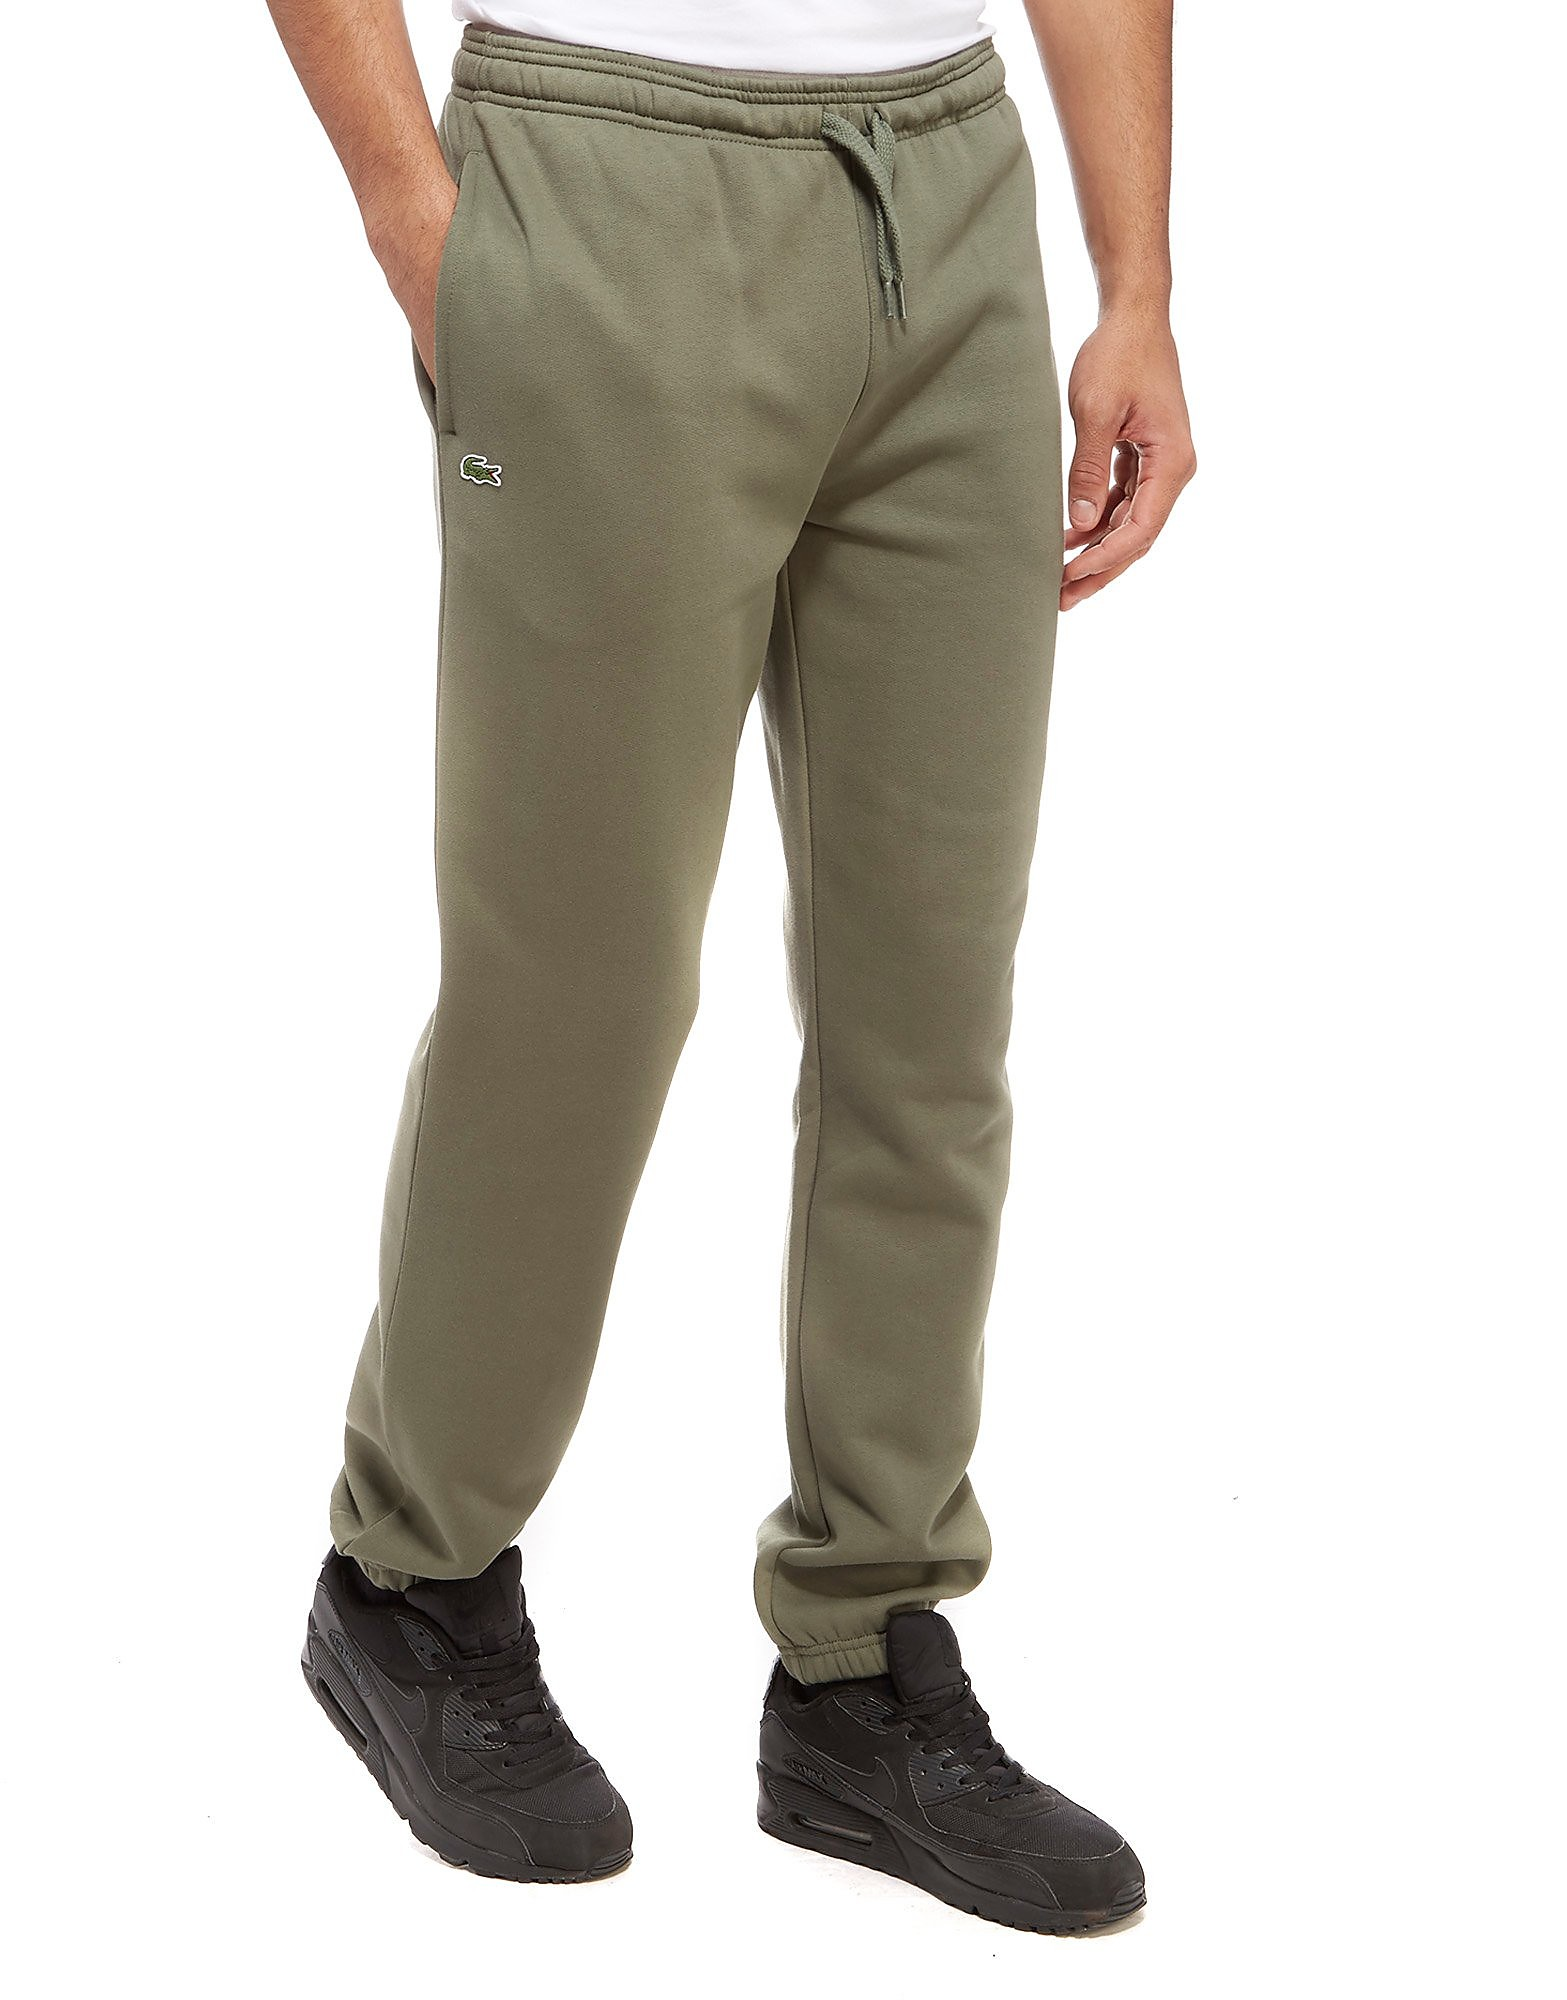 Lacoste Fleece Pants - Army Green, Army Green